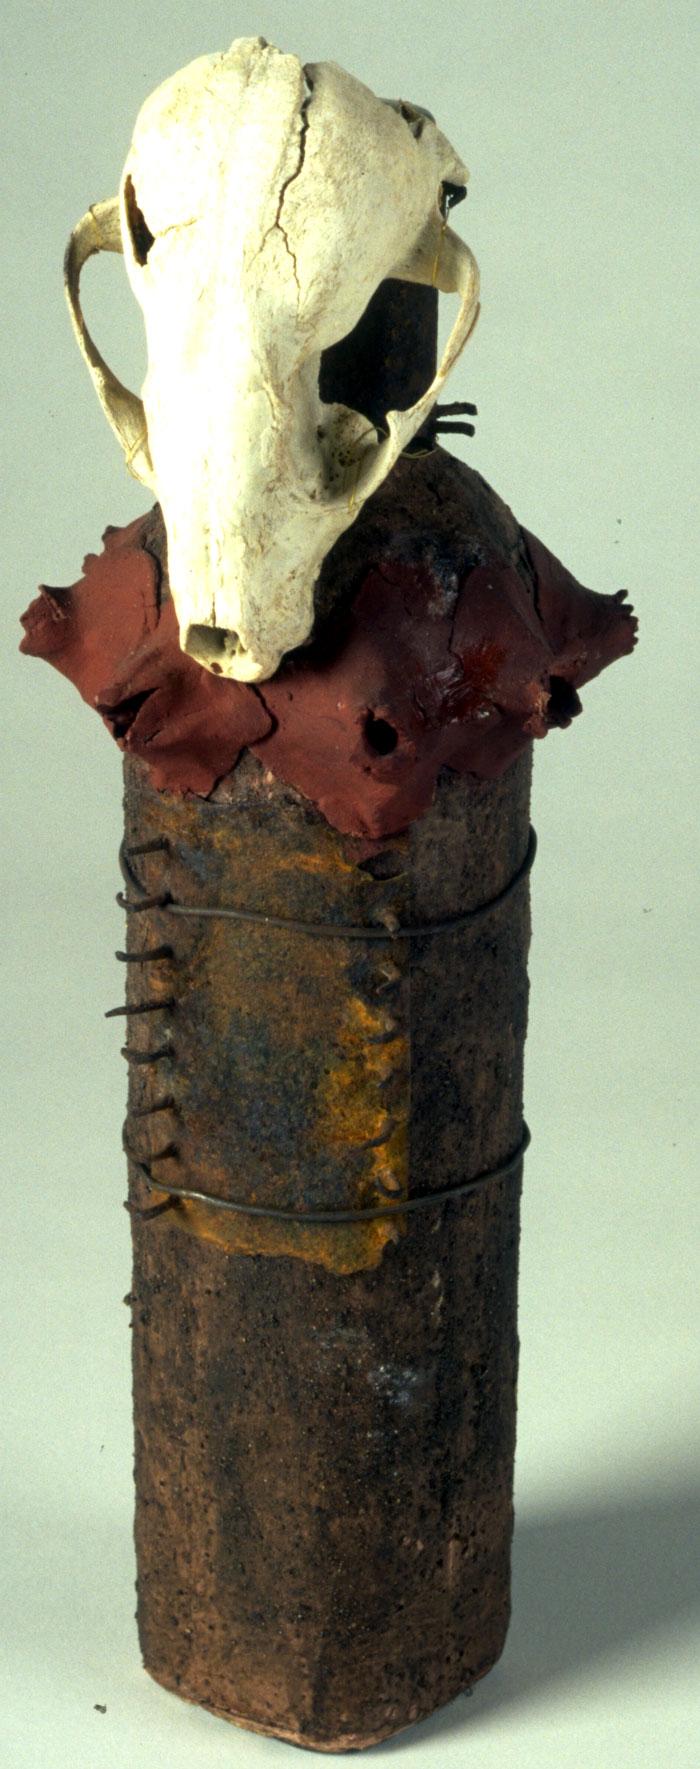 Bizango Bottle, 1998